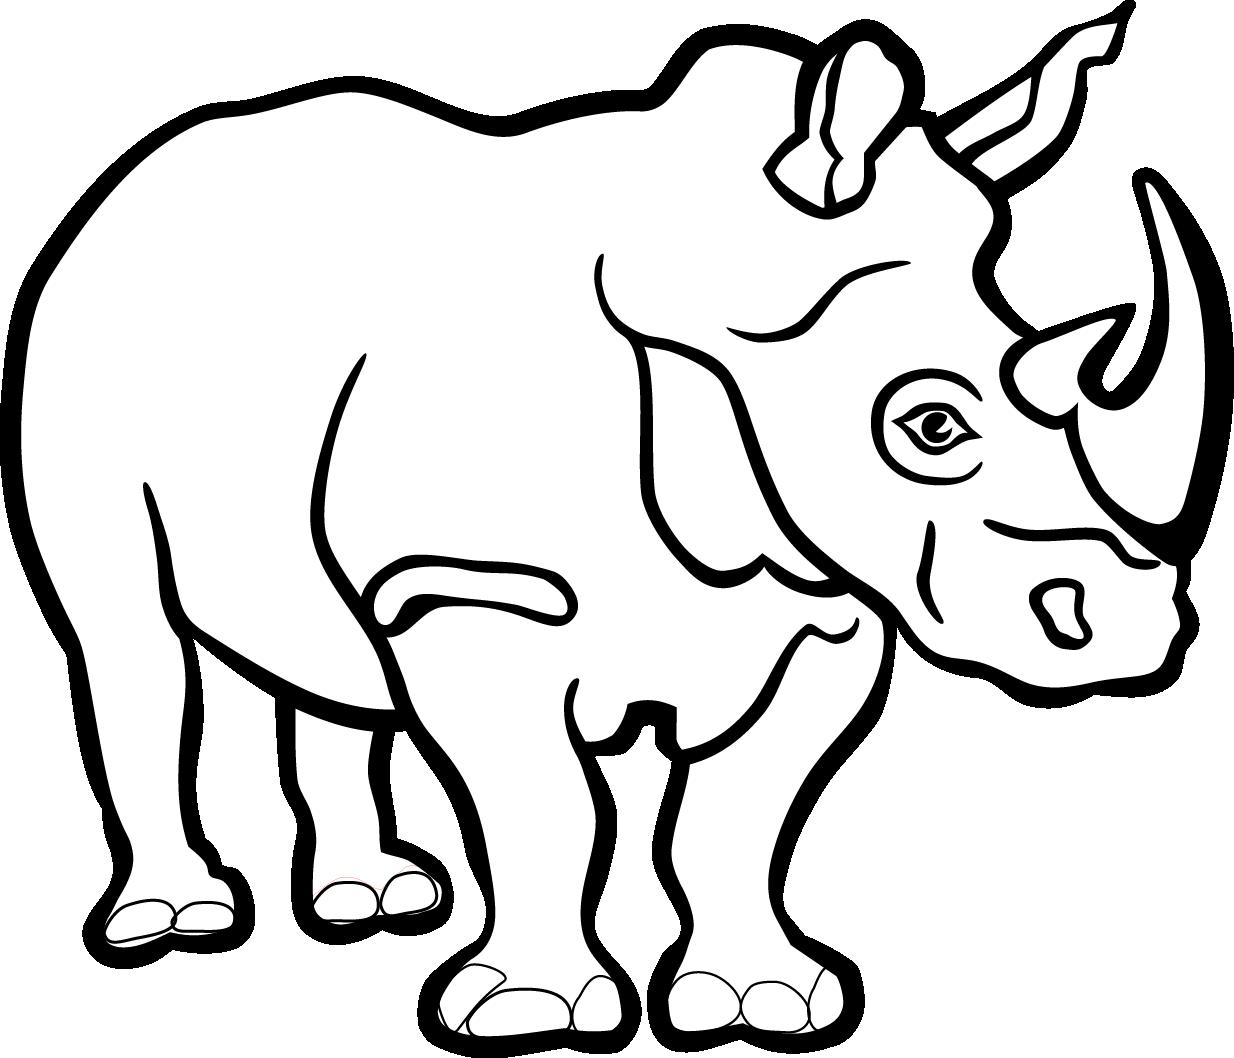 971 Rhino free clipart.